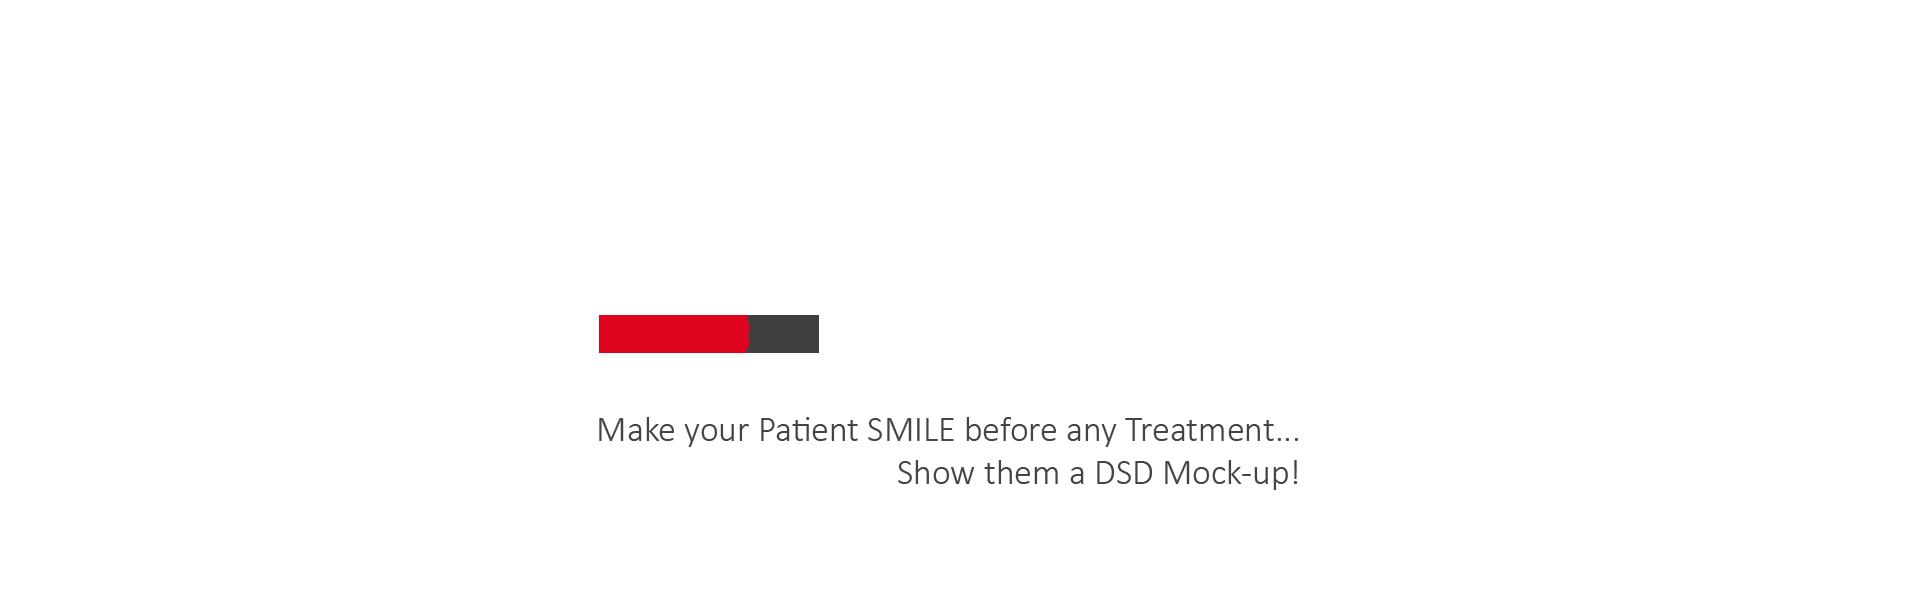 Dsd planning center creating smiles with digital smile design freerunsca Images